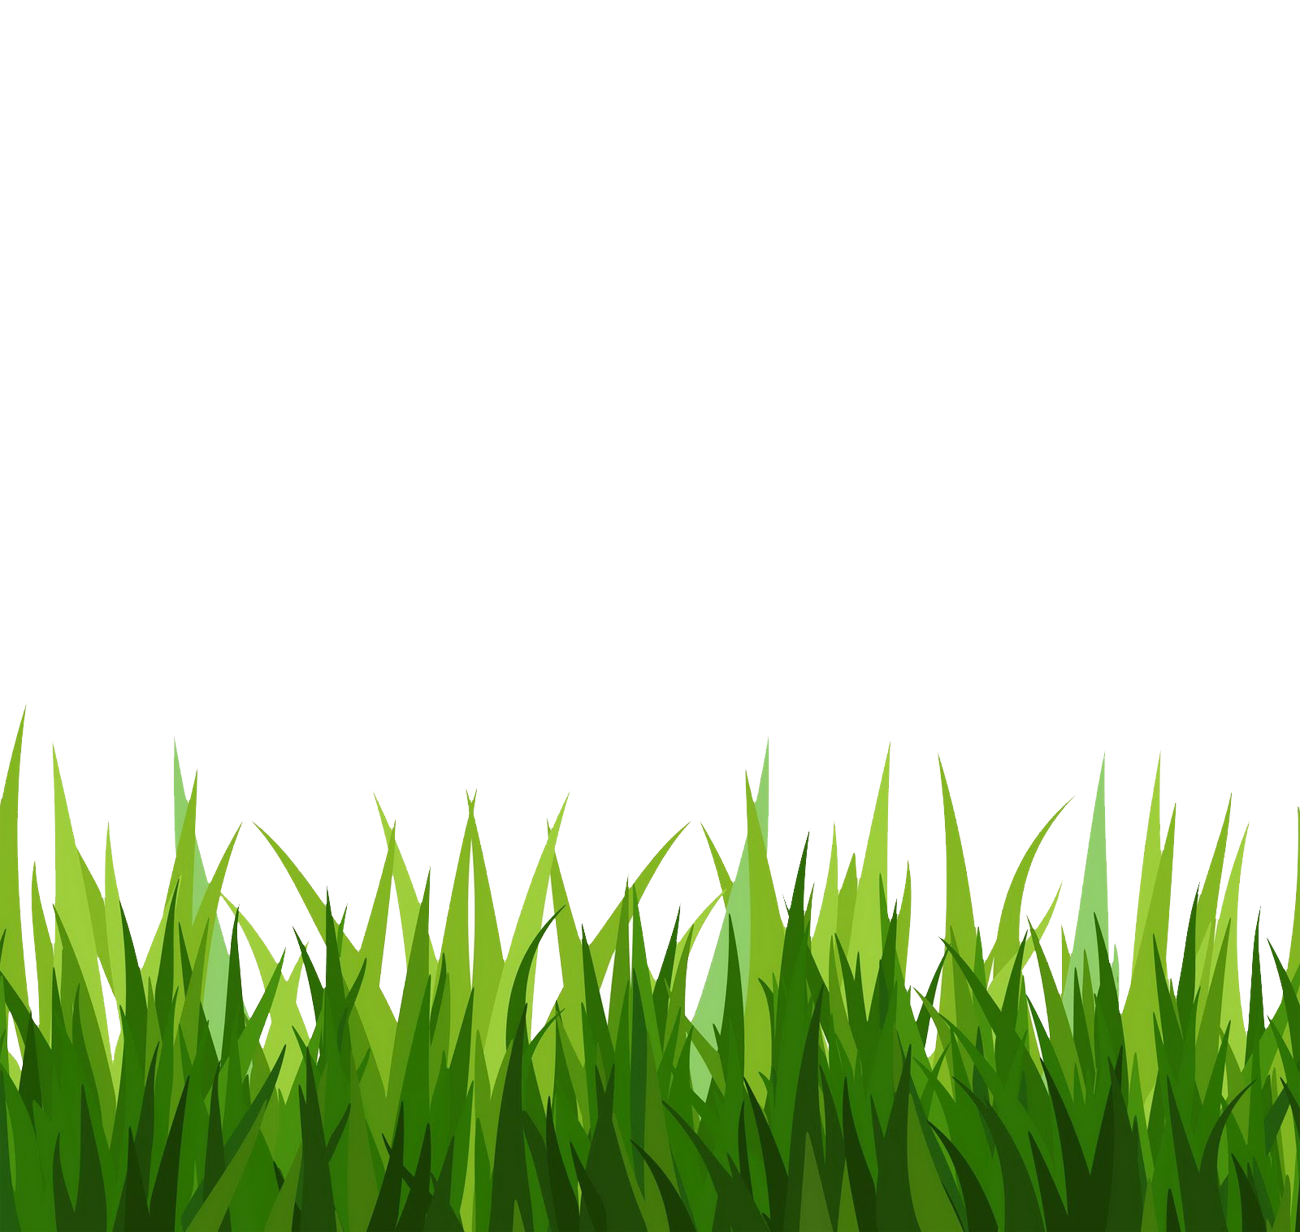 Green Grass Clipart image #44861